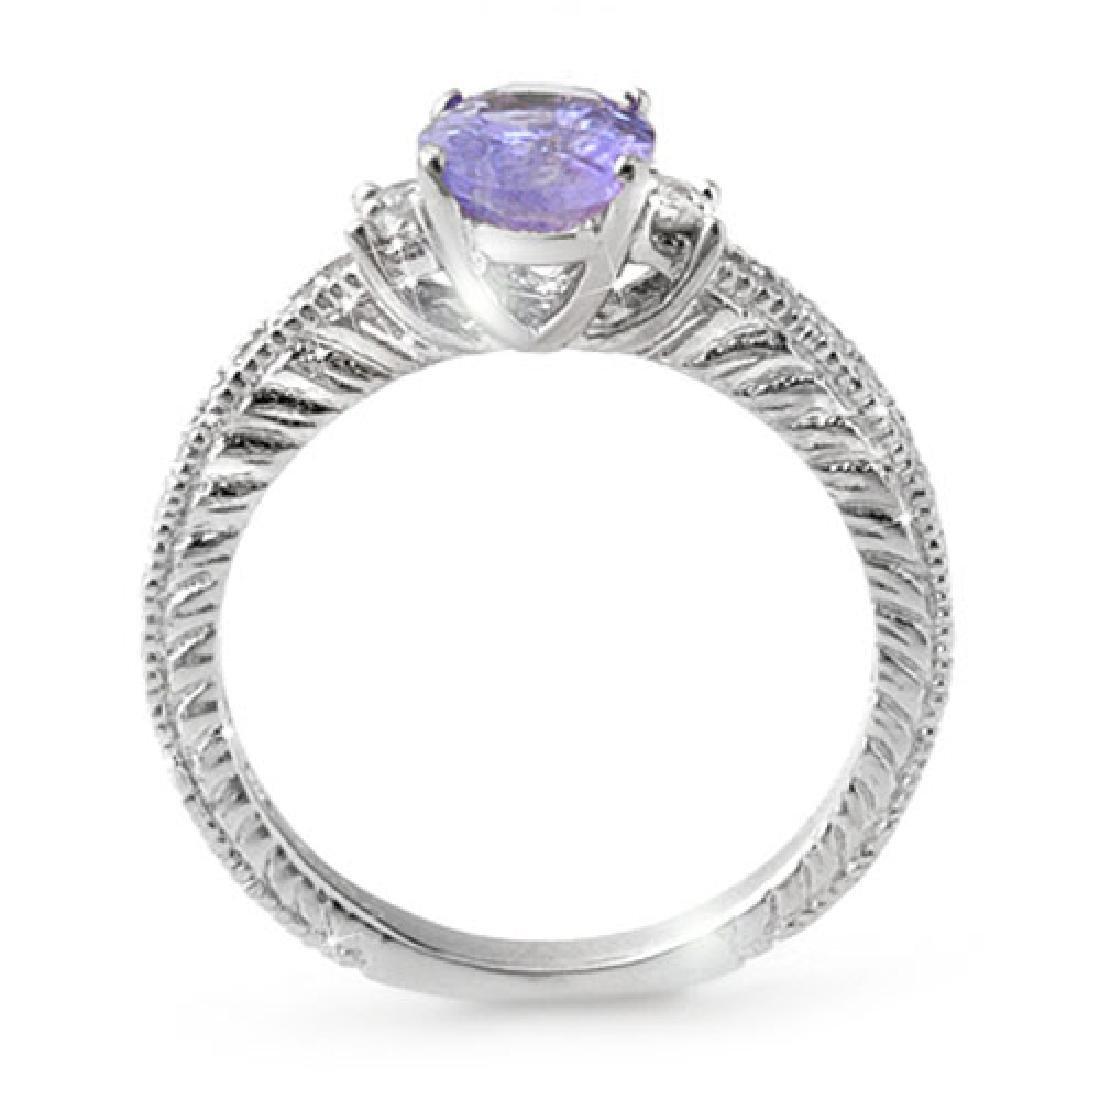 1.82 CTW Tanzanite & Diamond Ring 14K White Gold - 2